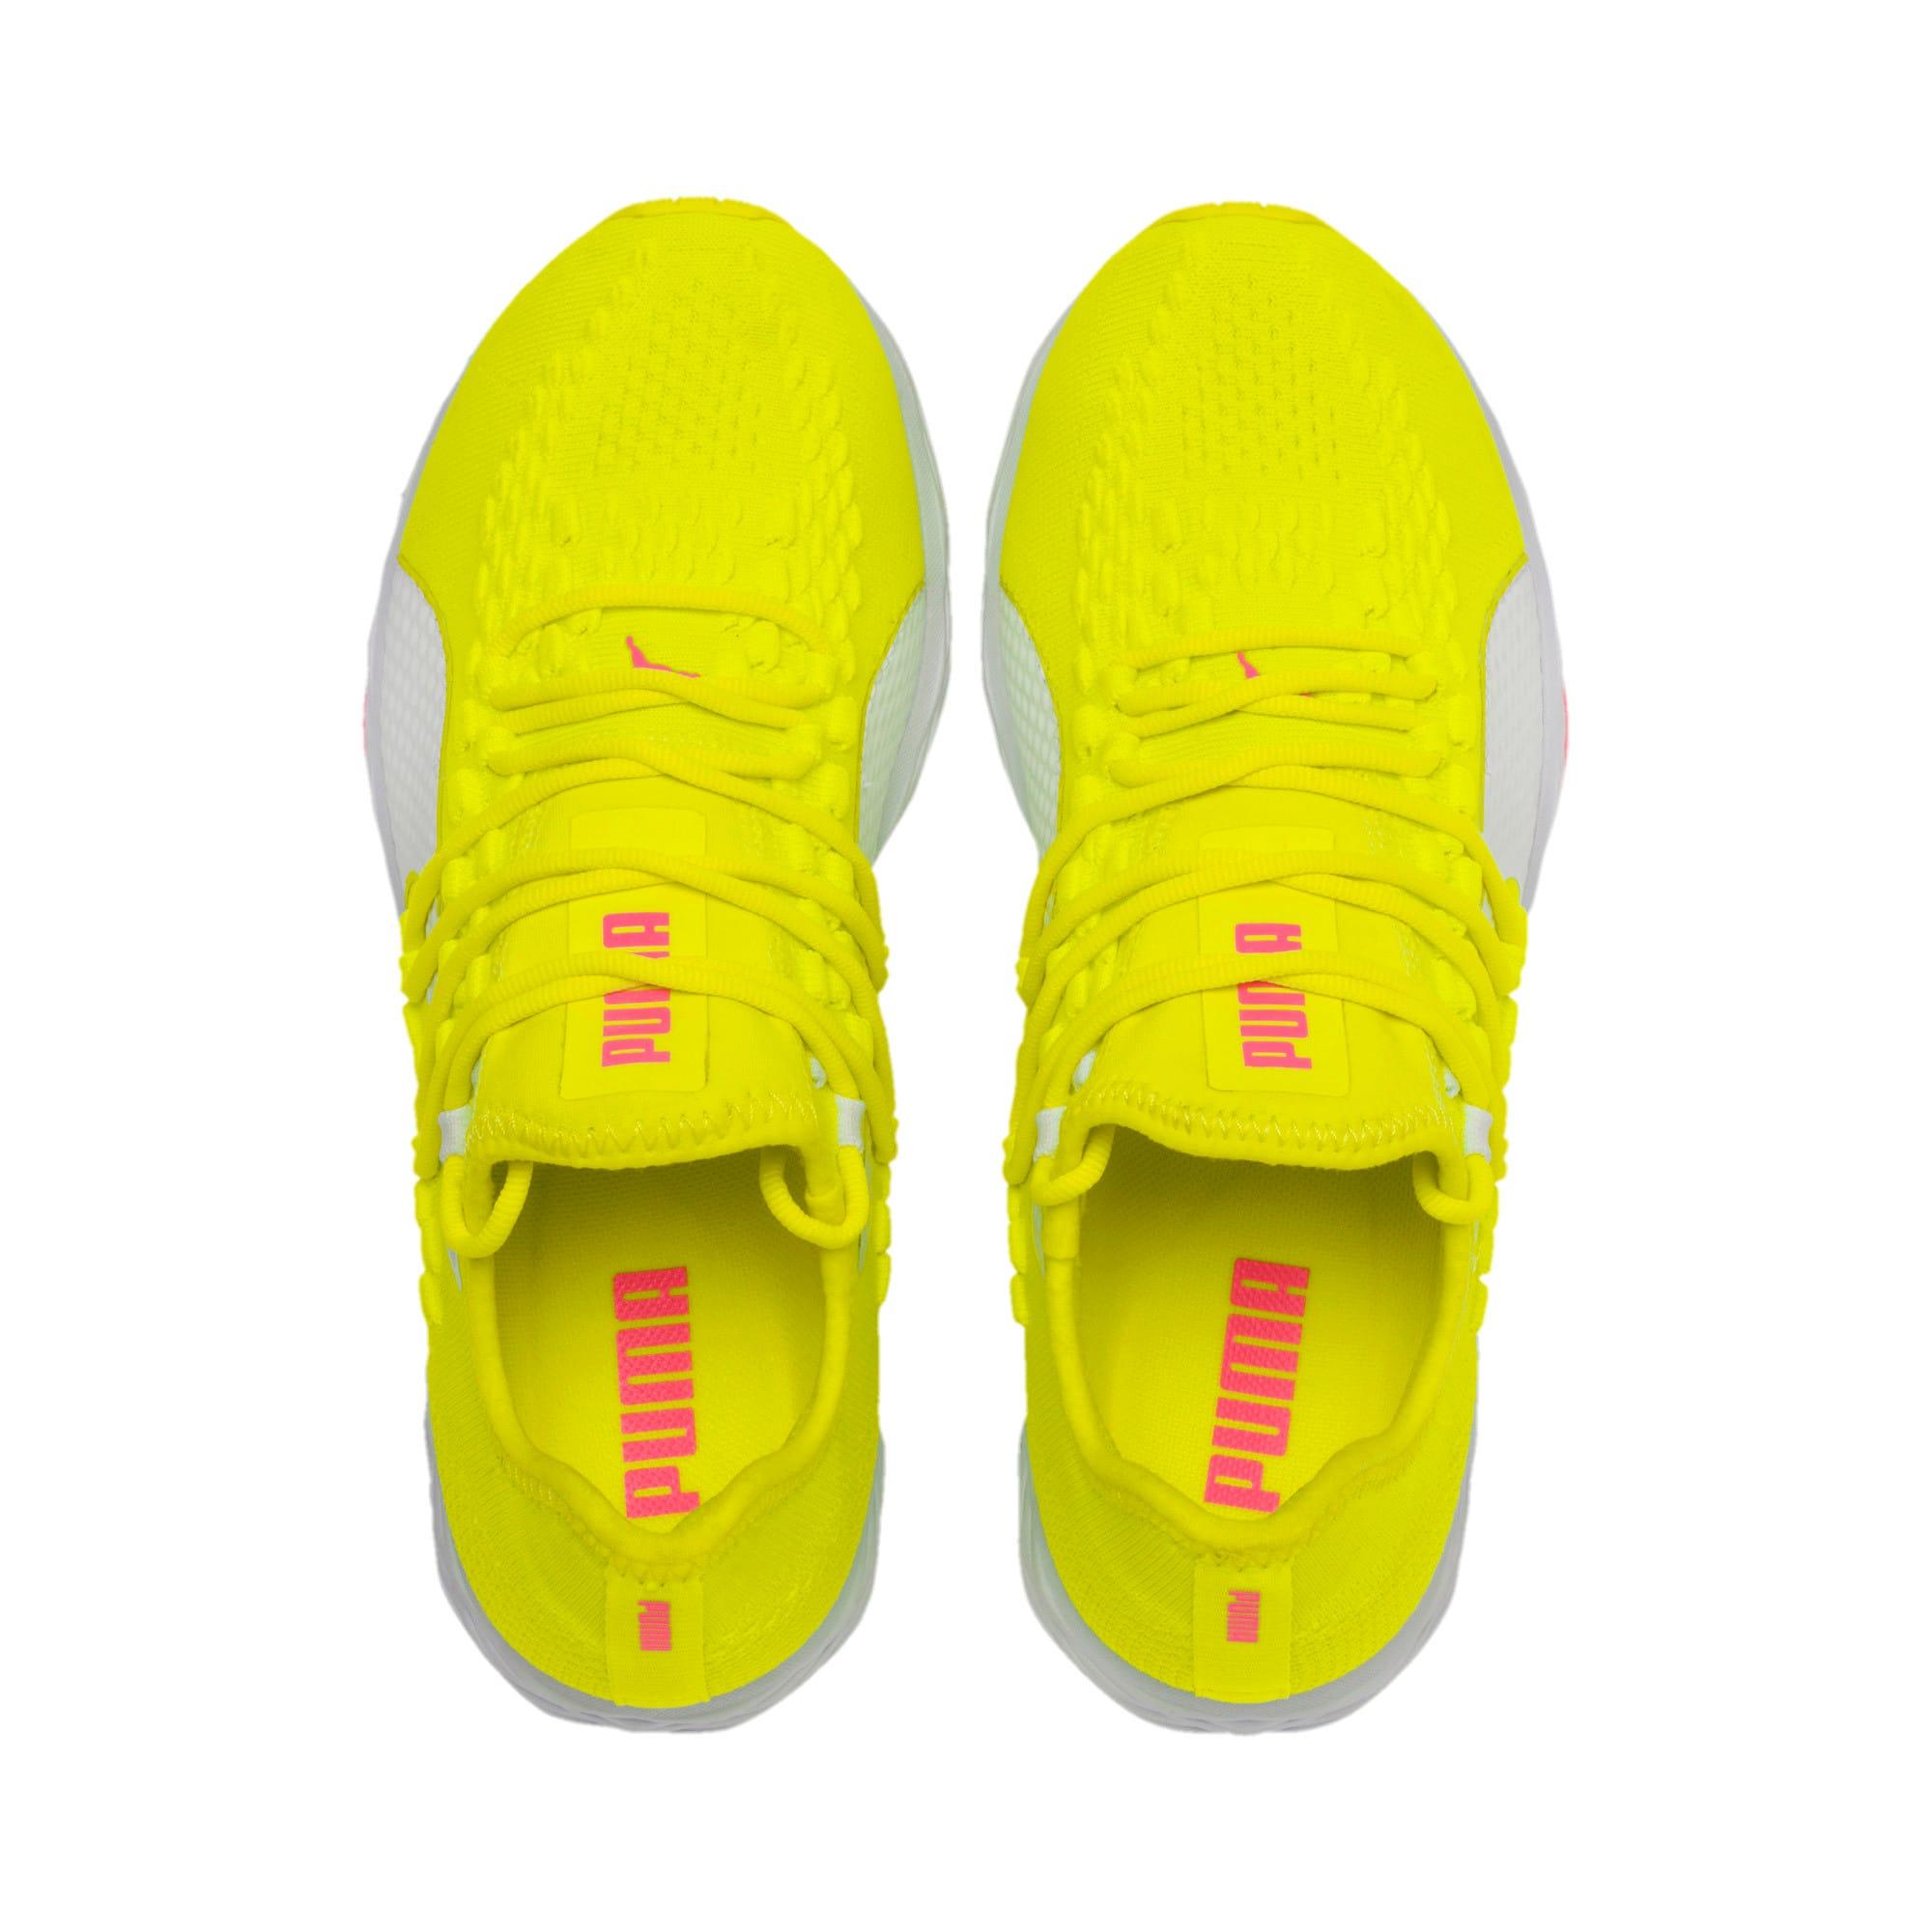 Thumbnail 8 of SPEED RACER Women's Running Shoes, Yellow-White-Pink Alert, medium-IND